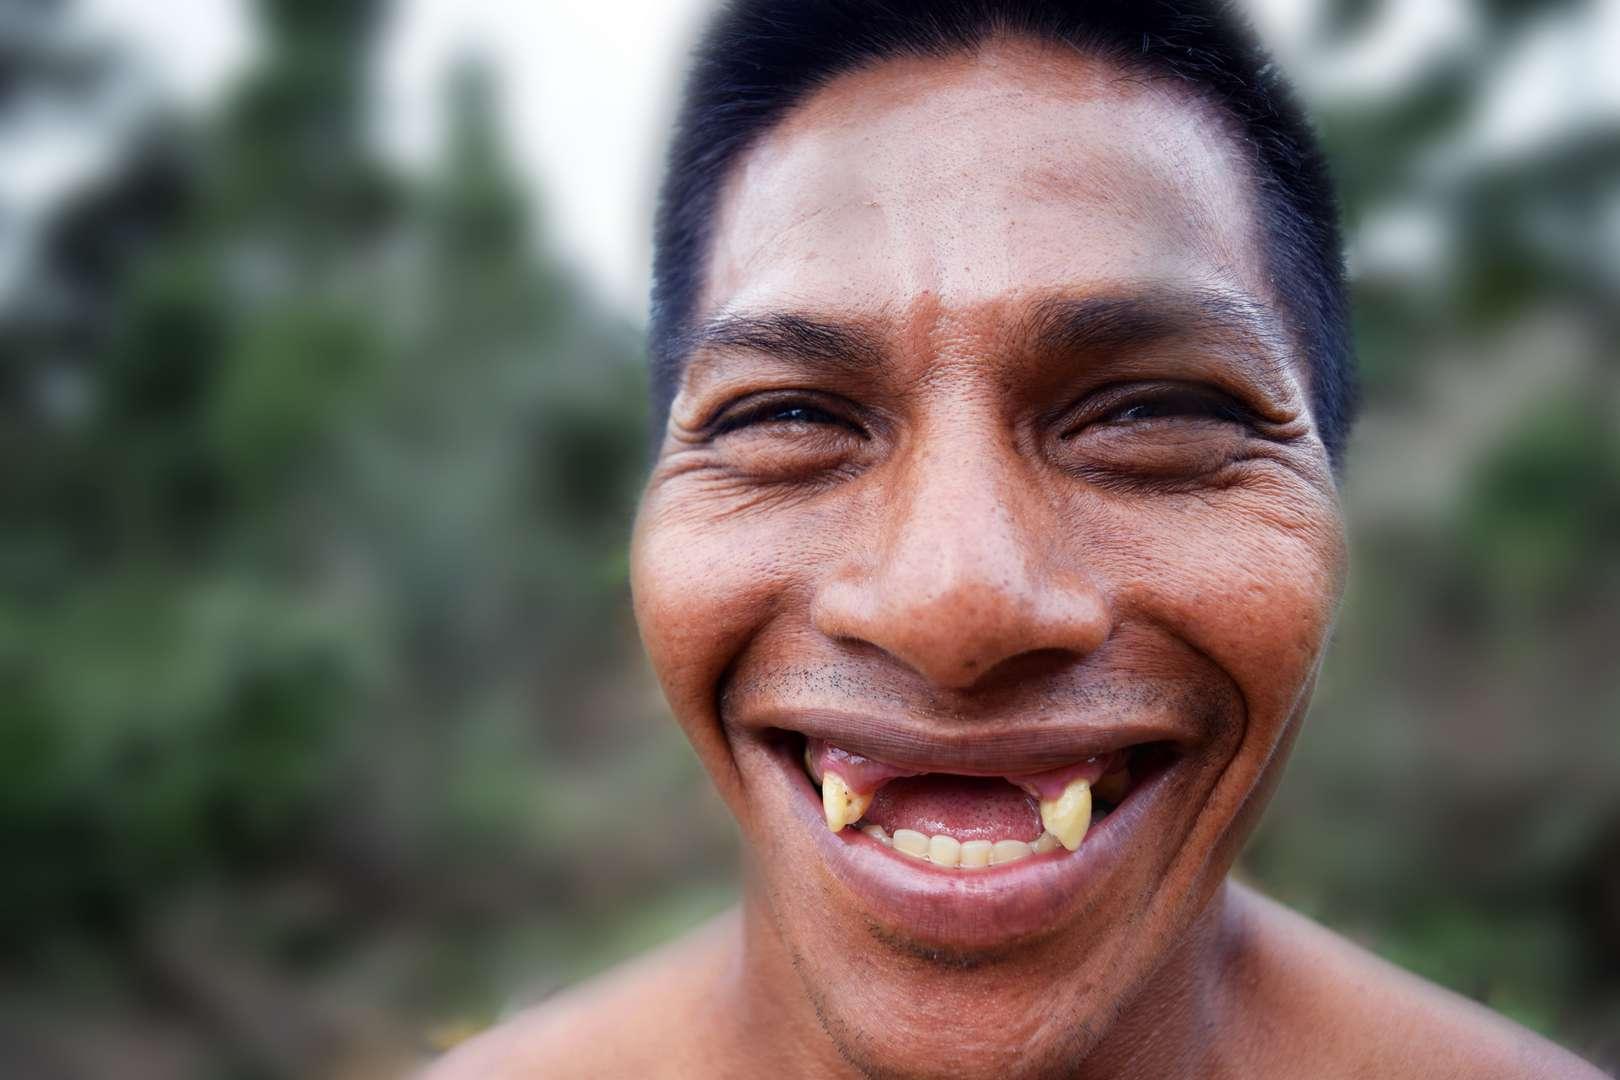 indigenous Waorani tribemember with missing teeth